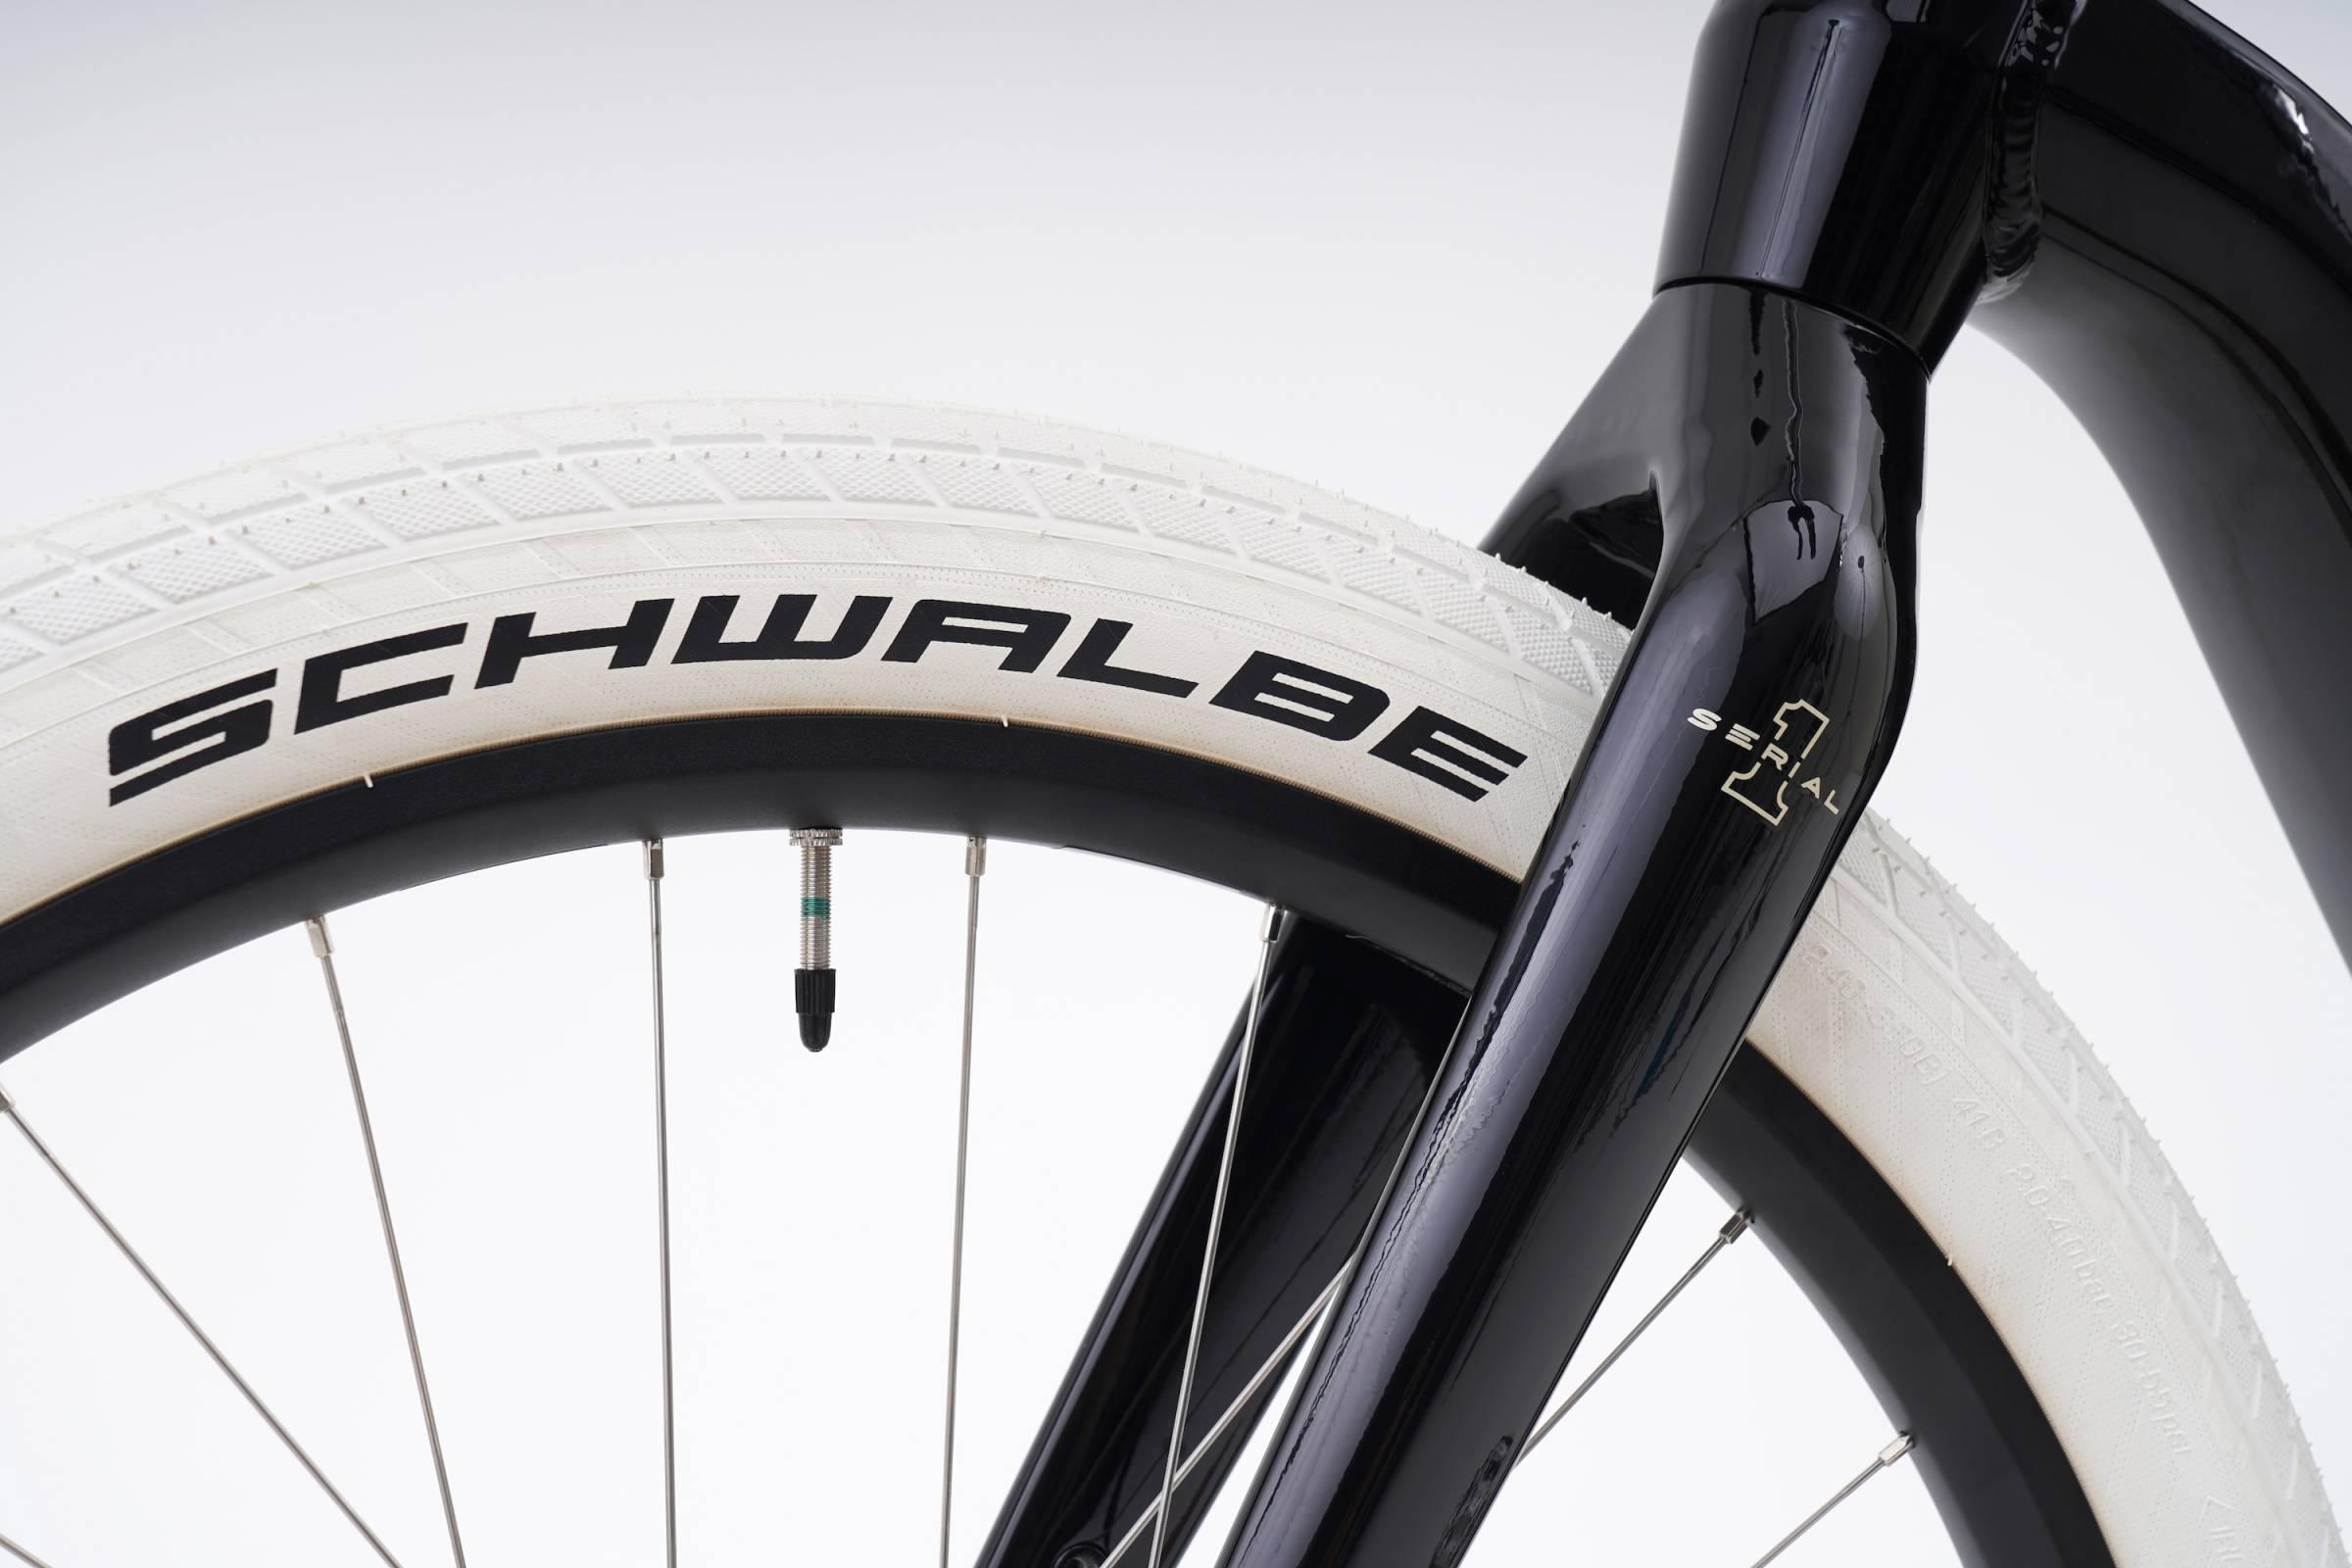 tire detail near the fork on the Serial 1 S1 Mosh/Tribute e-bike